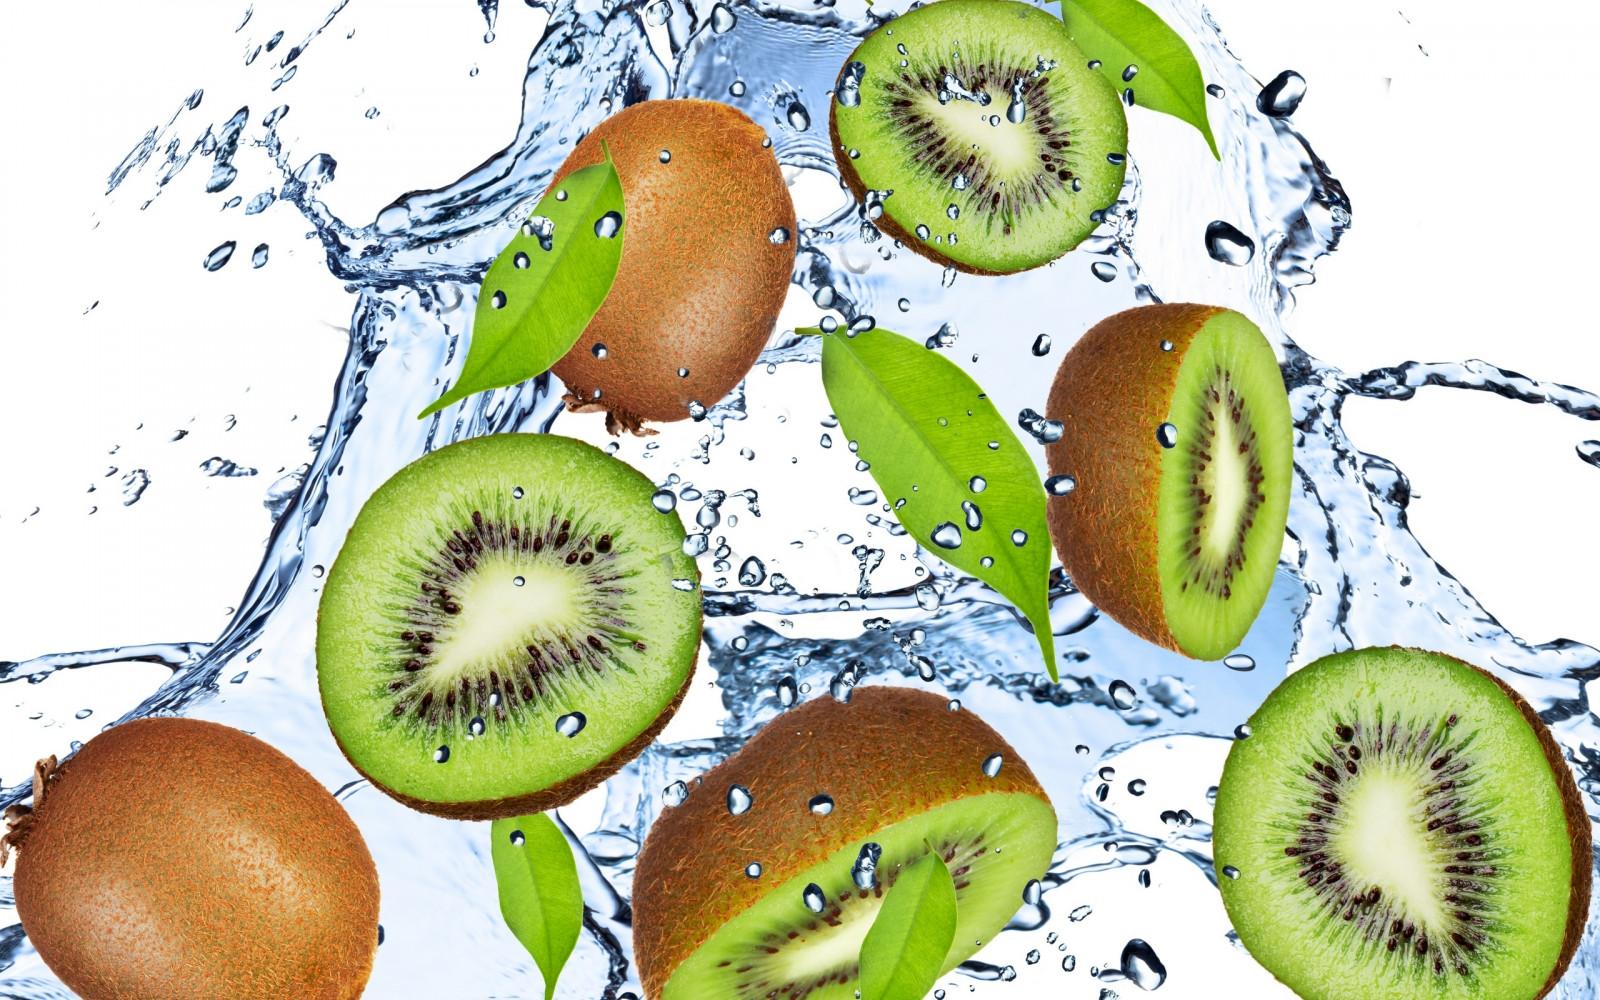 fruit, kiwi fruit, green, water, drops, sprays, freshness